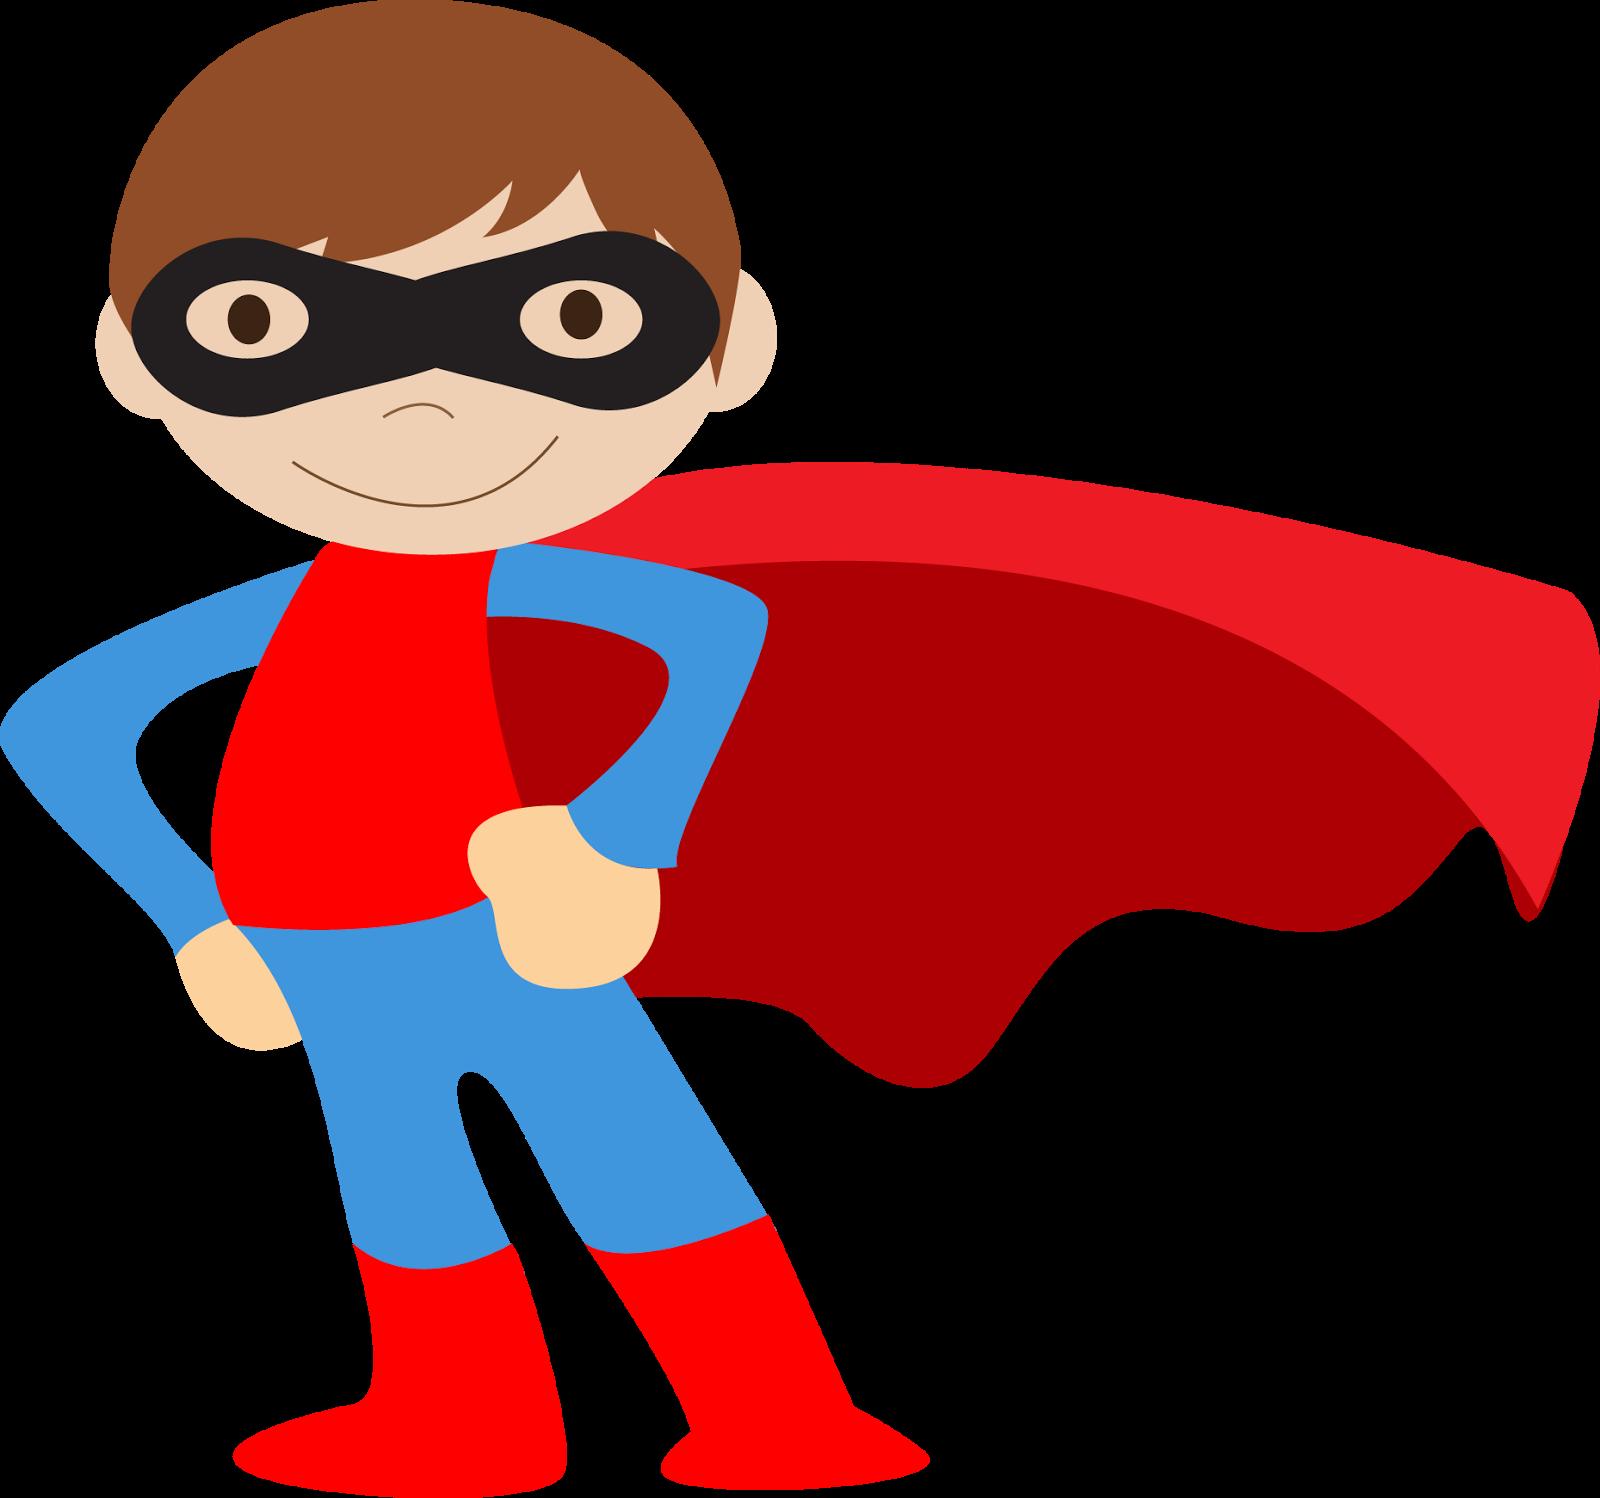 clip art download Kids dressed as superheroes. Mothers clipart superhero.